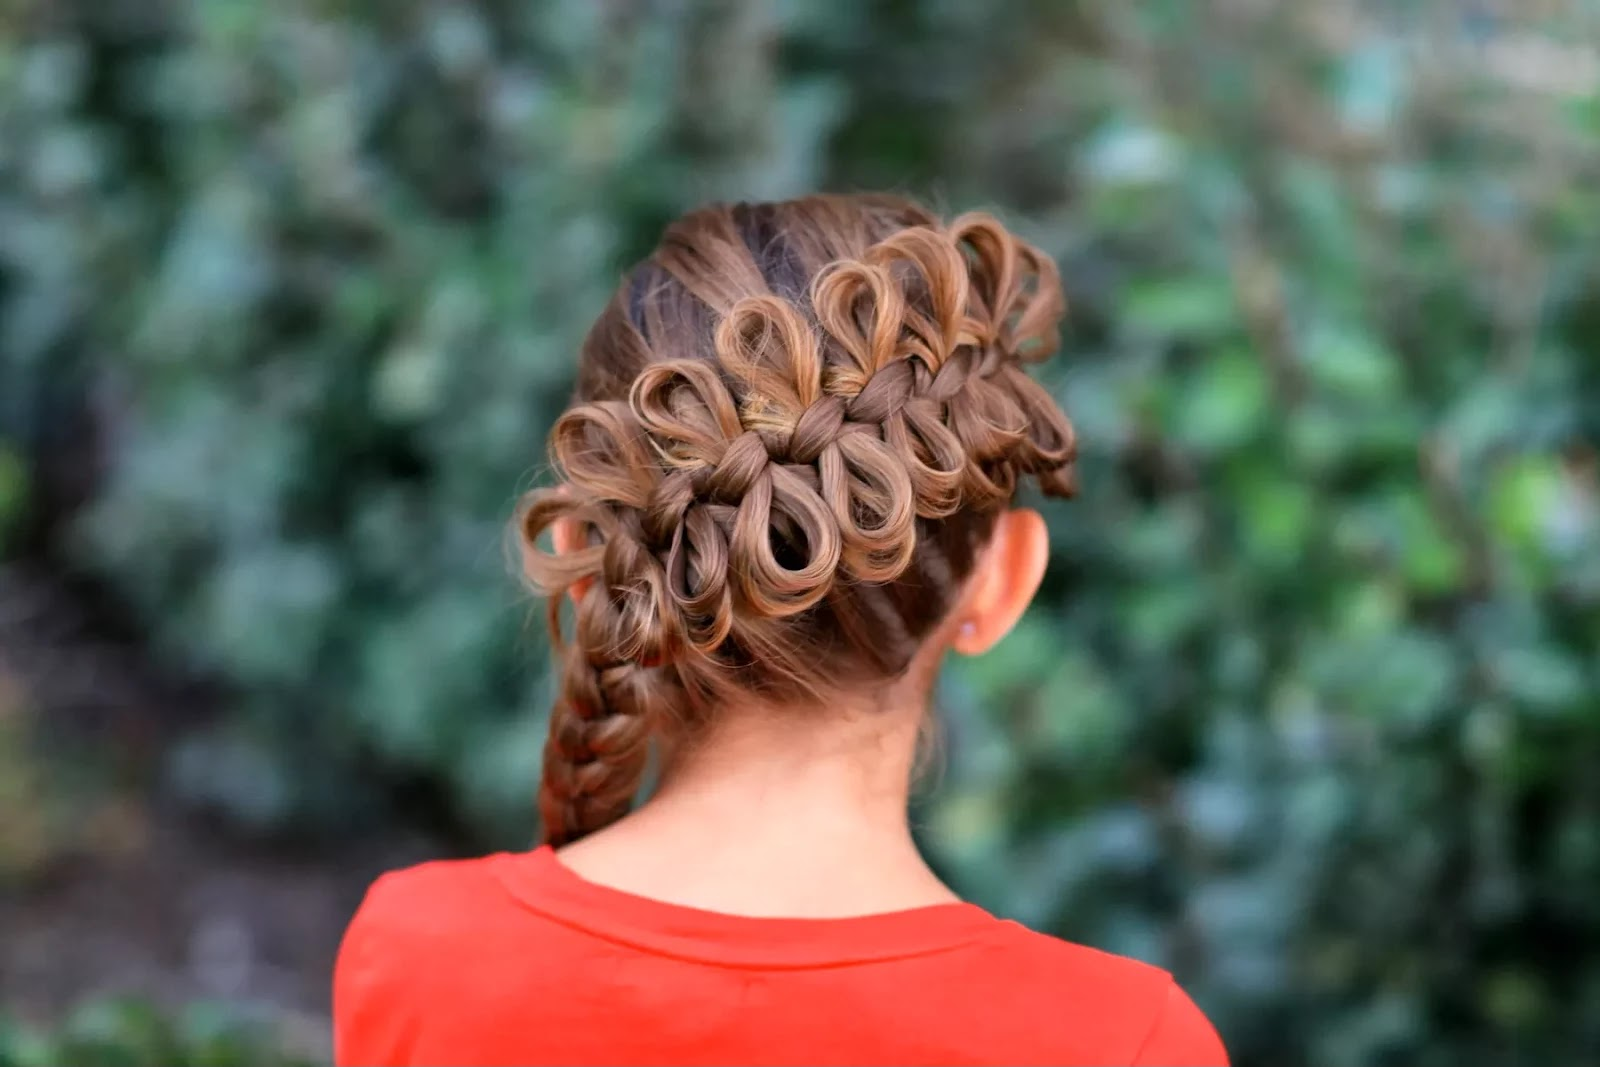 Hair Bow Styles: Women Fashion Updates: Diagonal Bow Braid Hairstyle For Girls